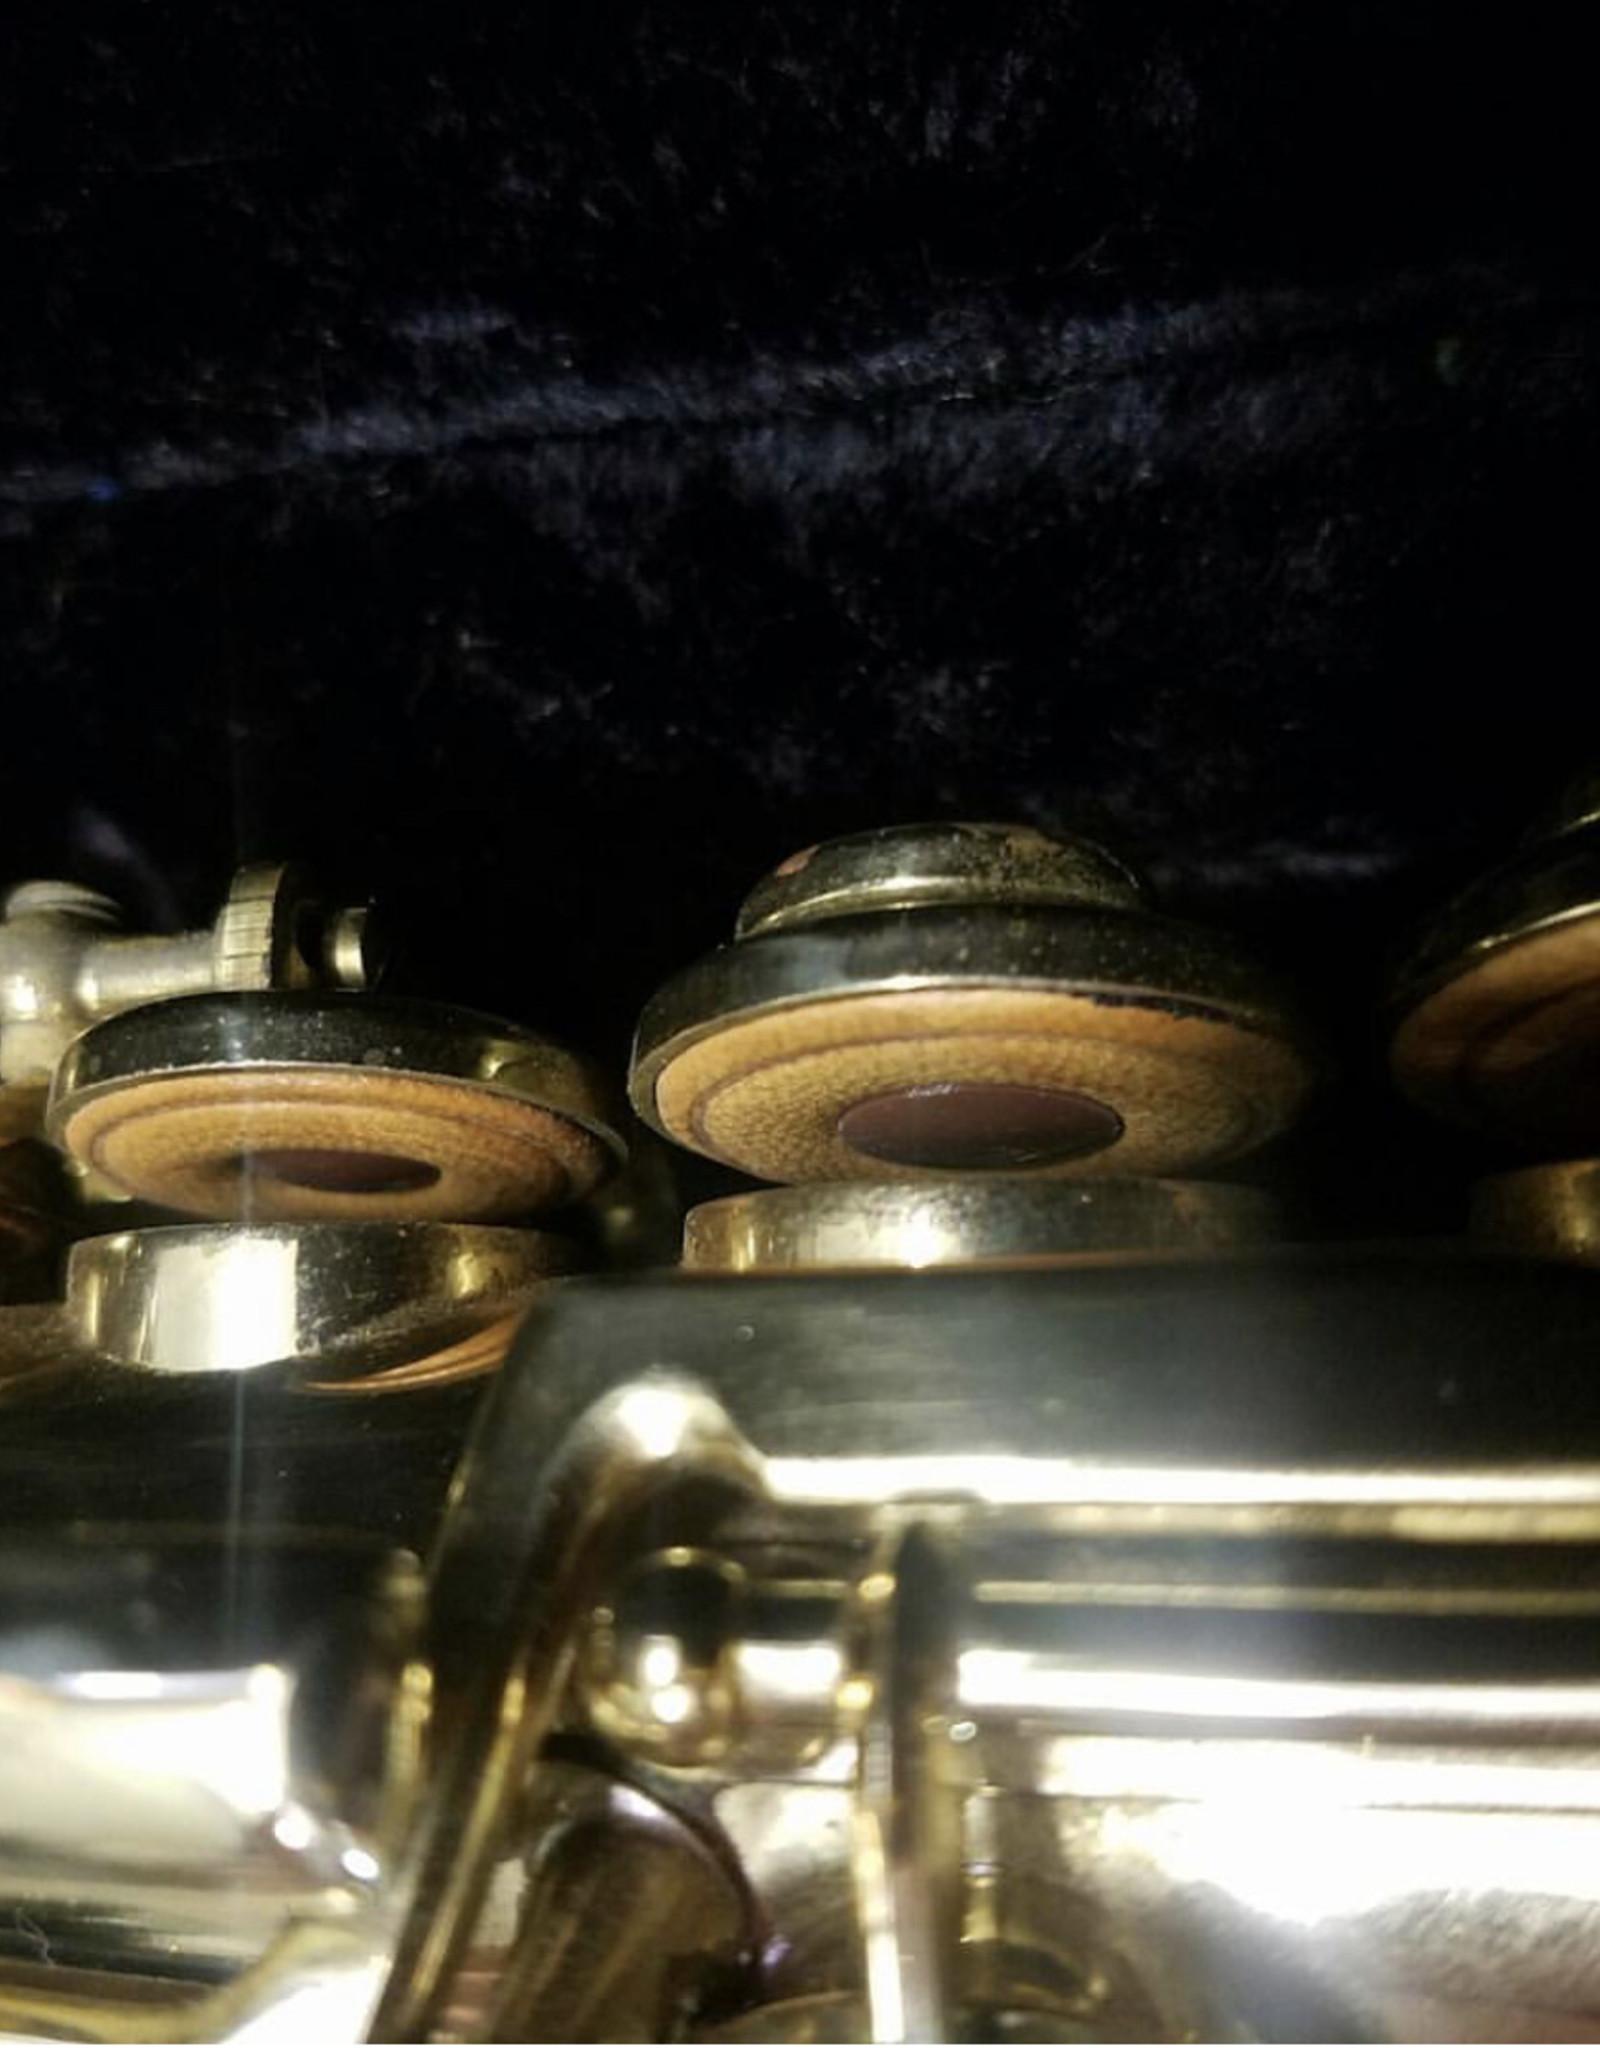 Selmer Selmer Mark VI original lacquer Soprano Saxophone 213XXX serial number